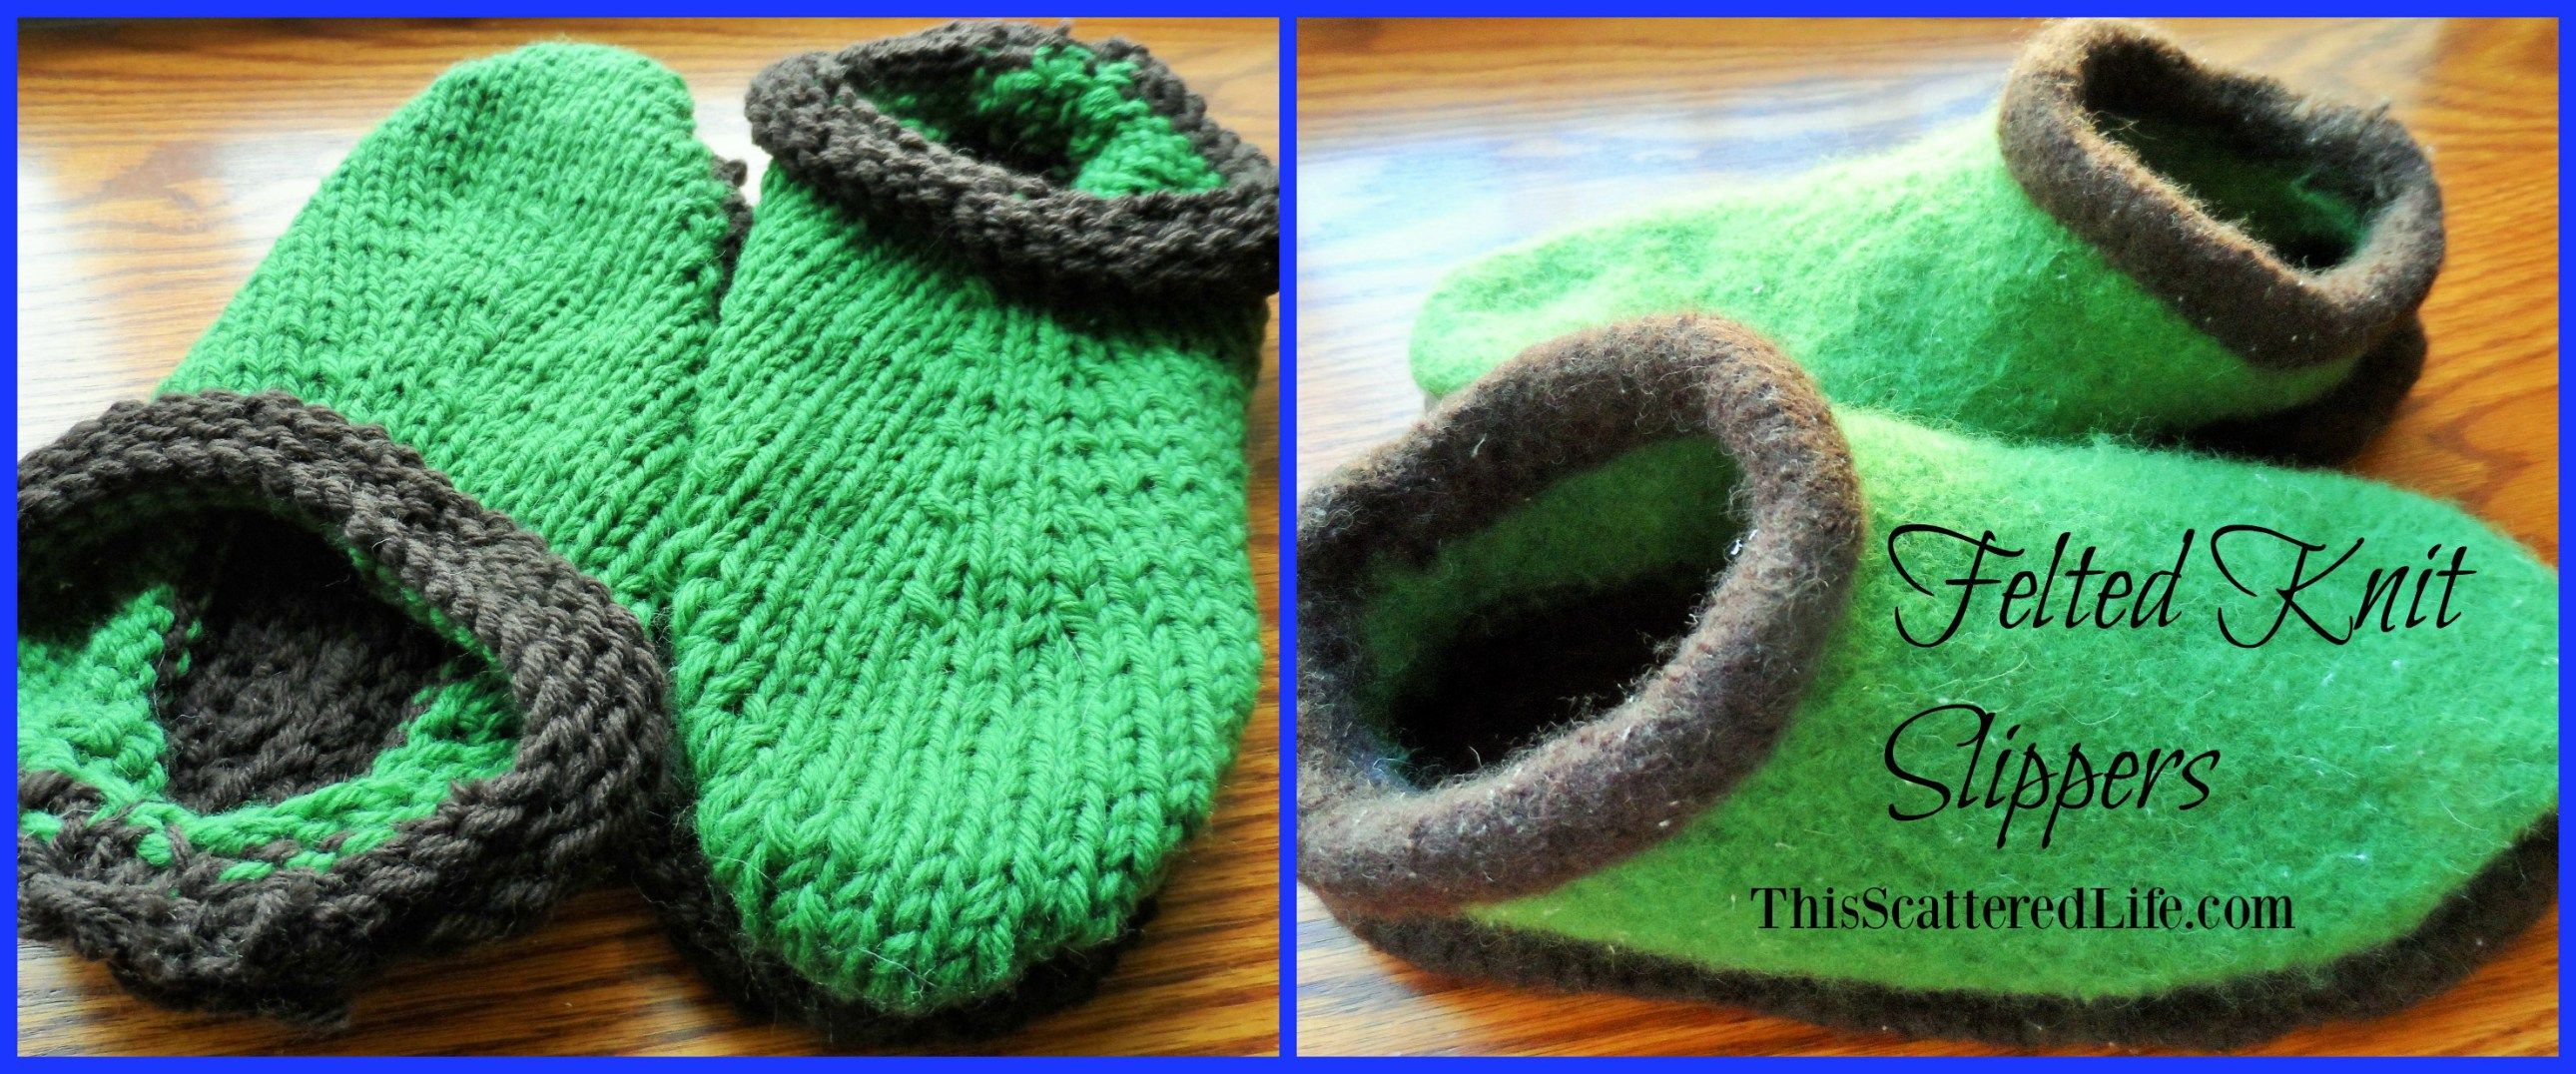 Felting 101: How to Felt Knitted Slippers | Felting and Felted slippers